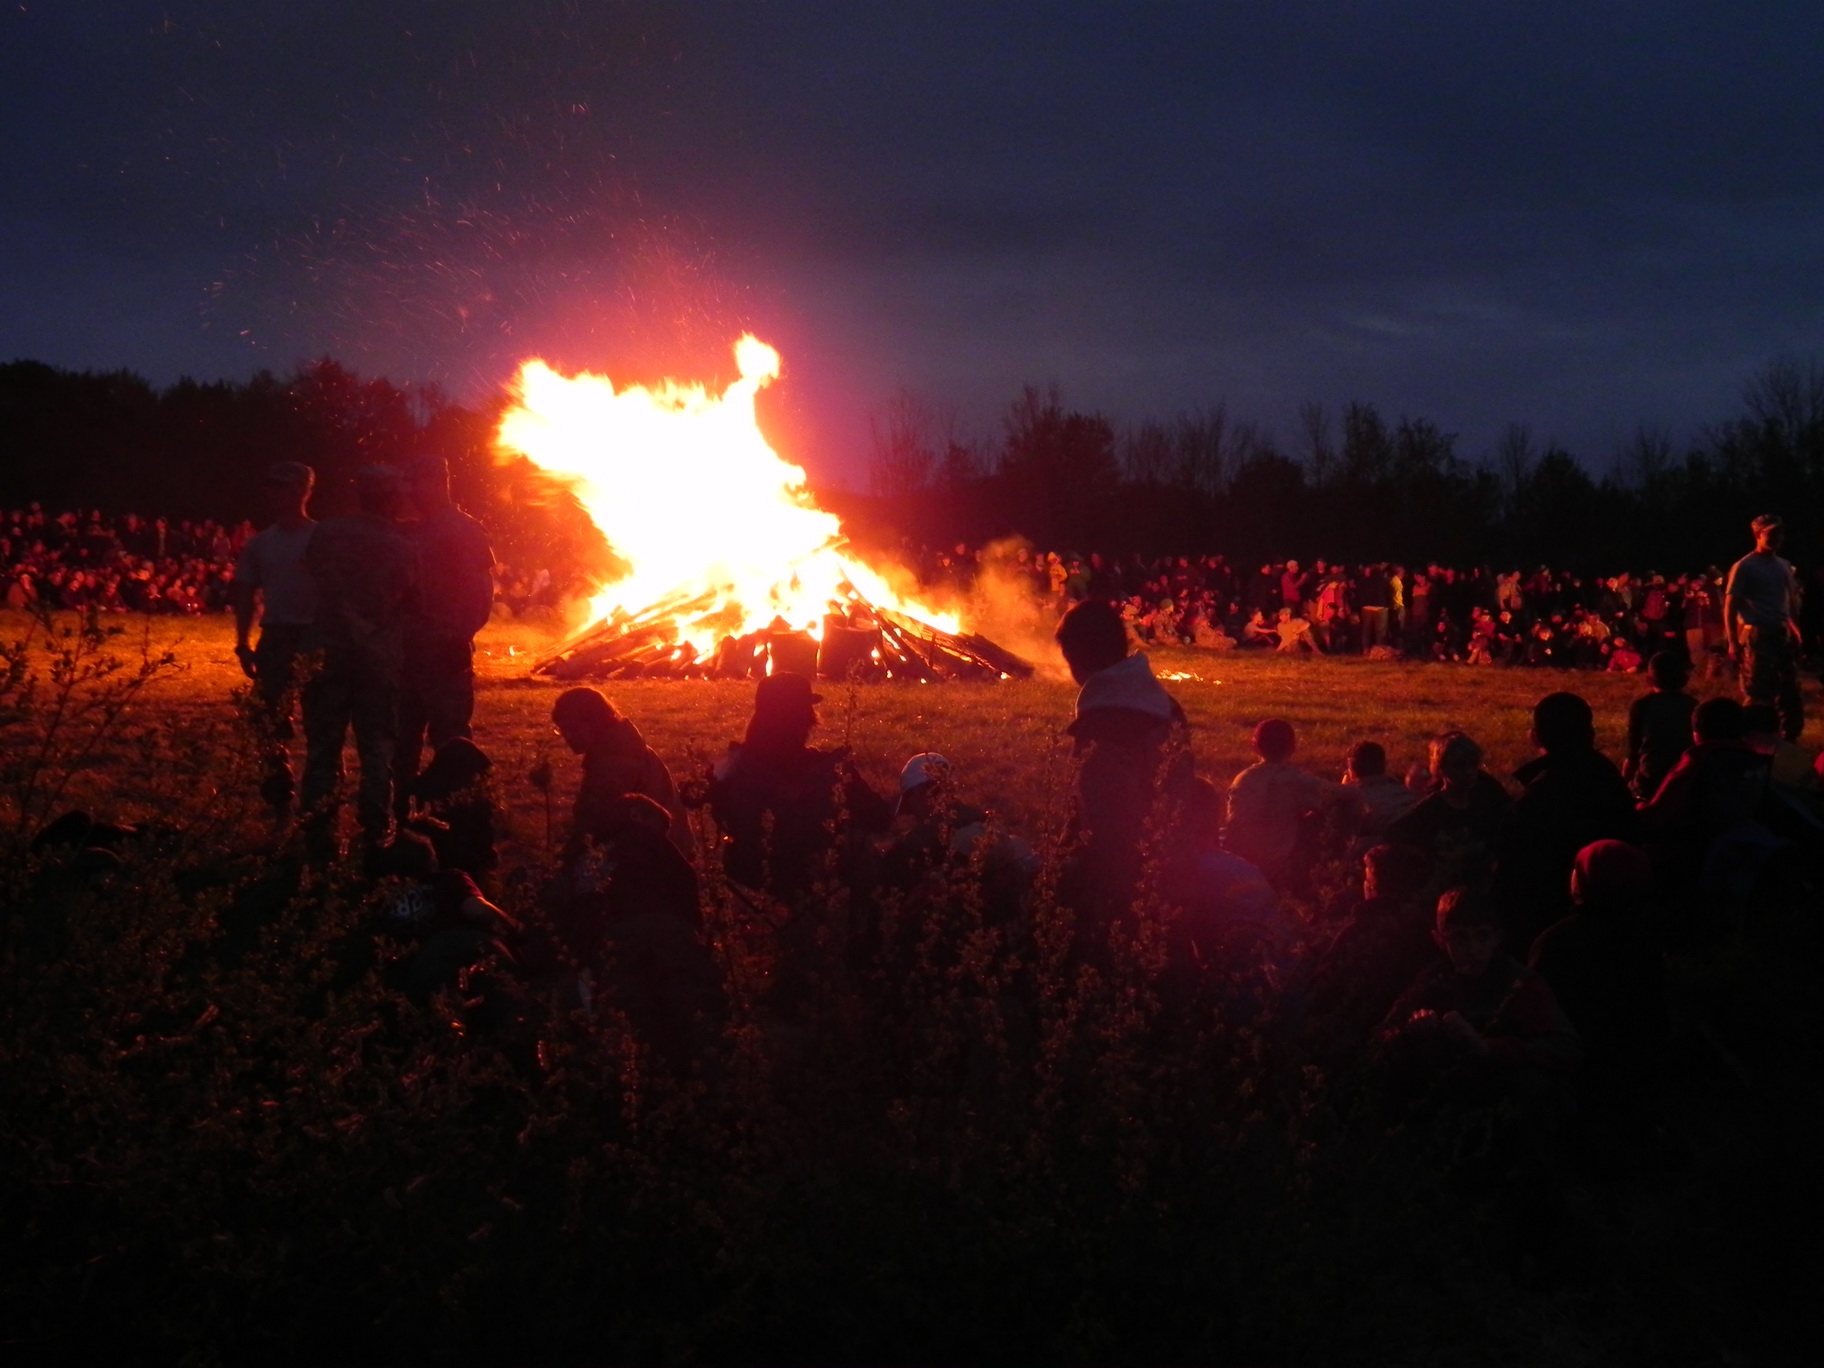 17 the Campfire lit